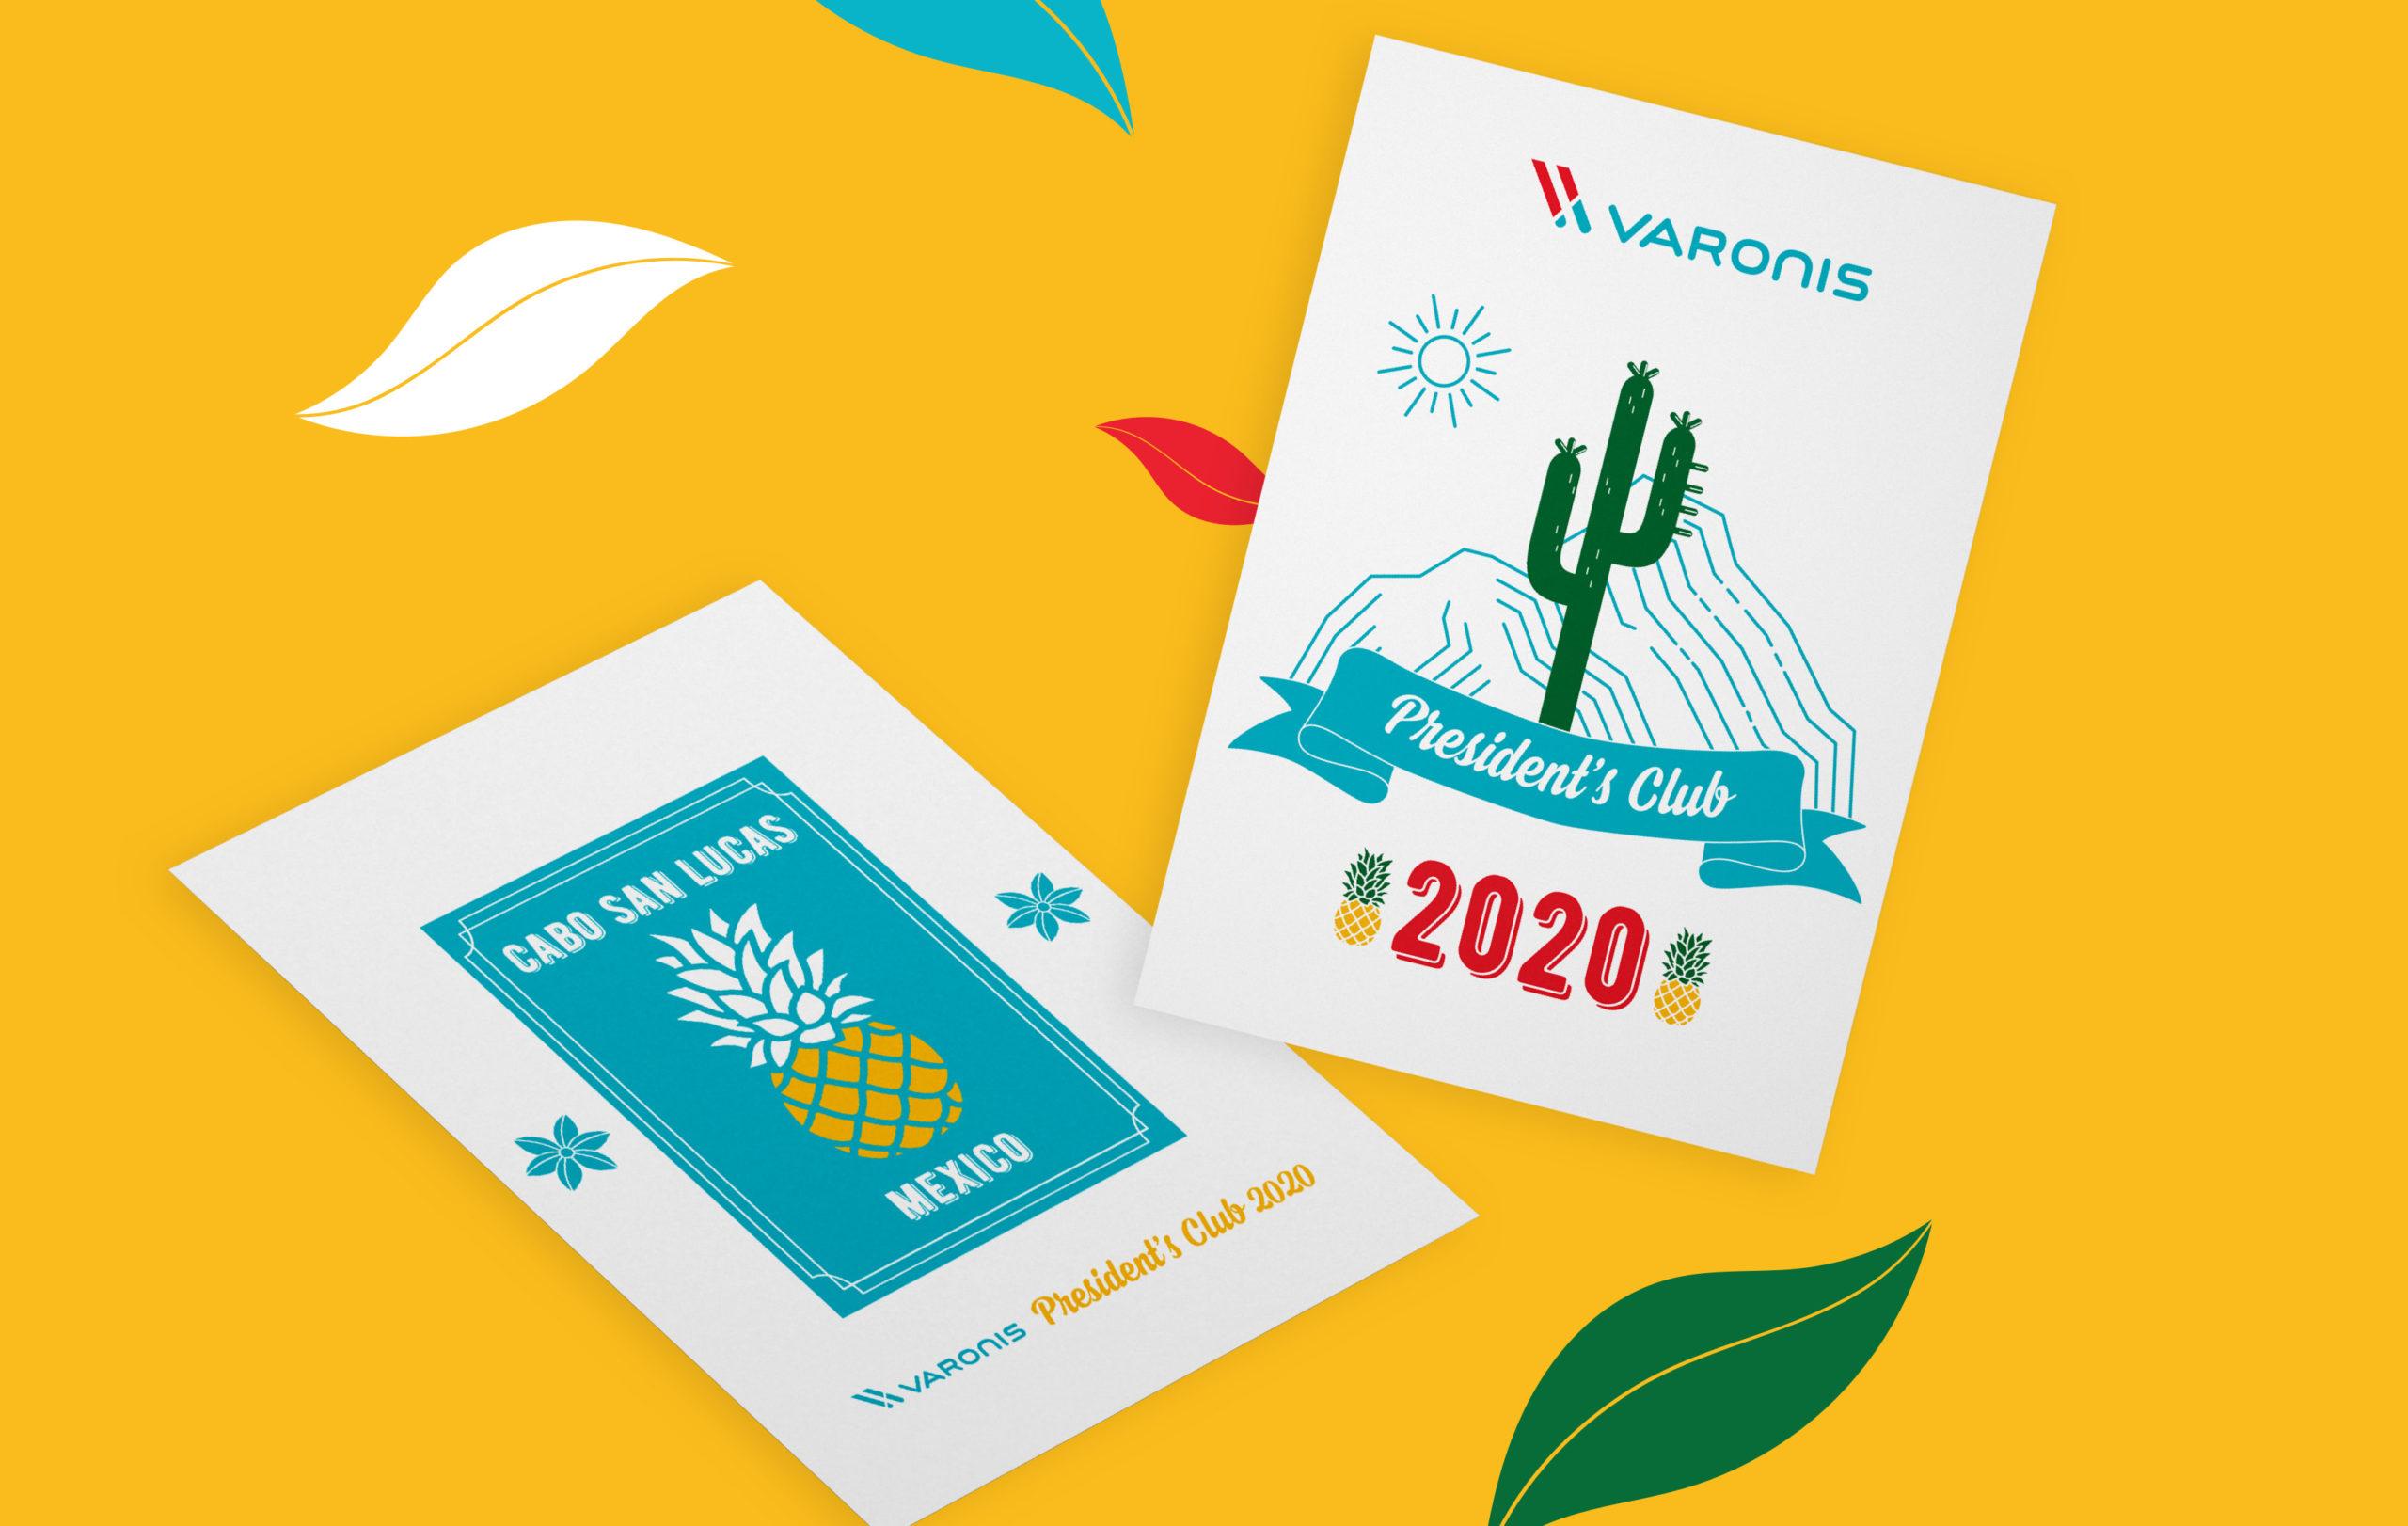 Hello-design-Varonis-president-club-2020-design